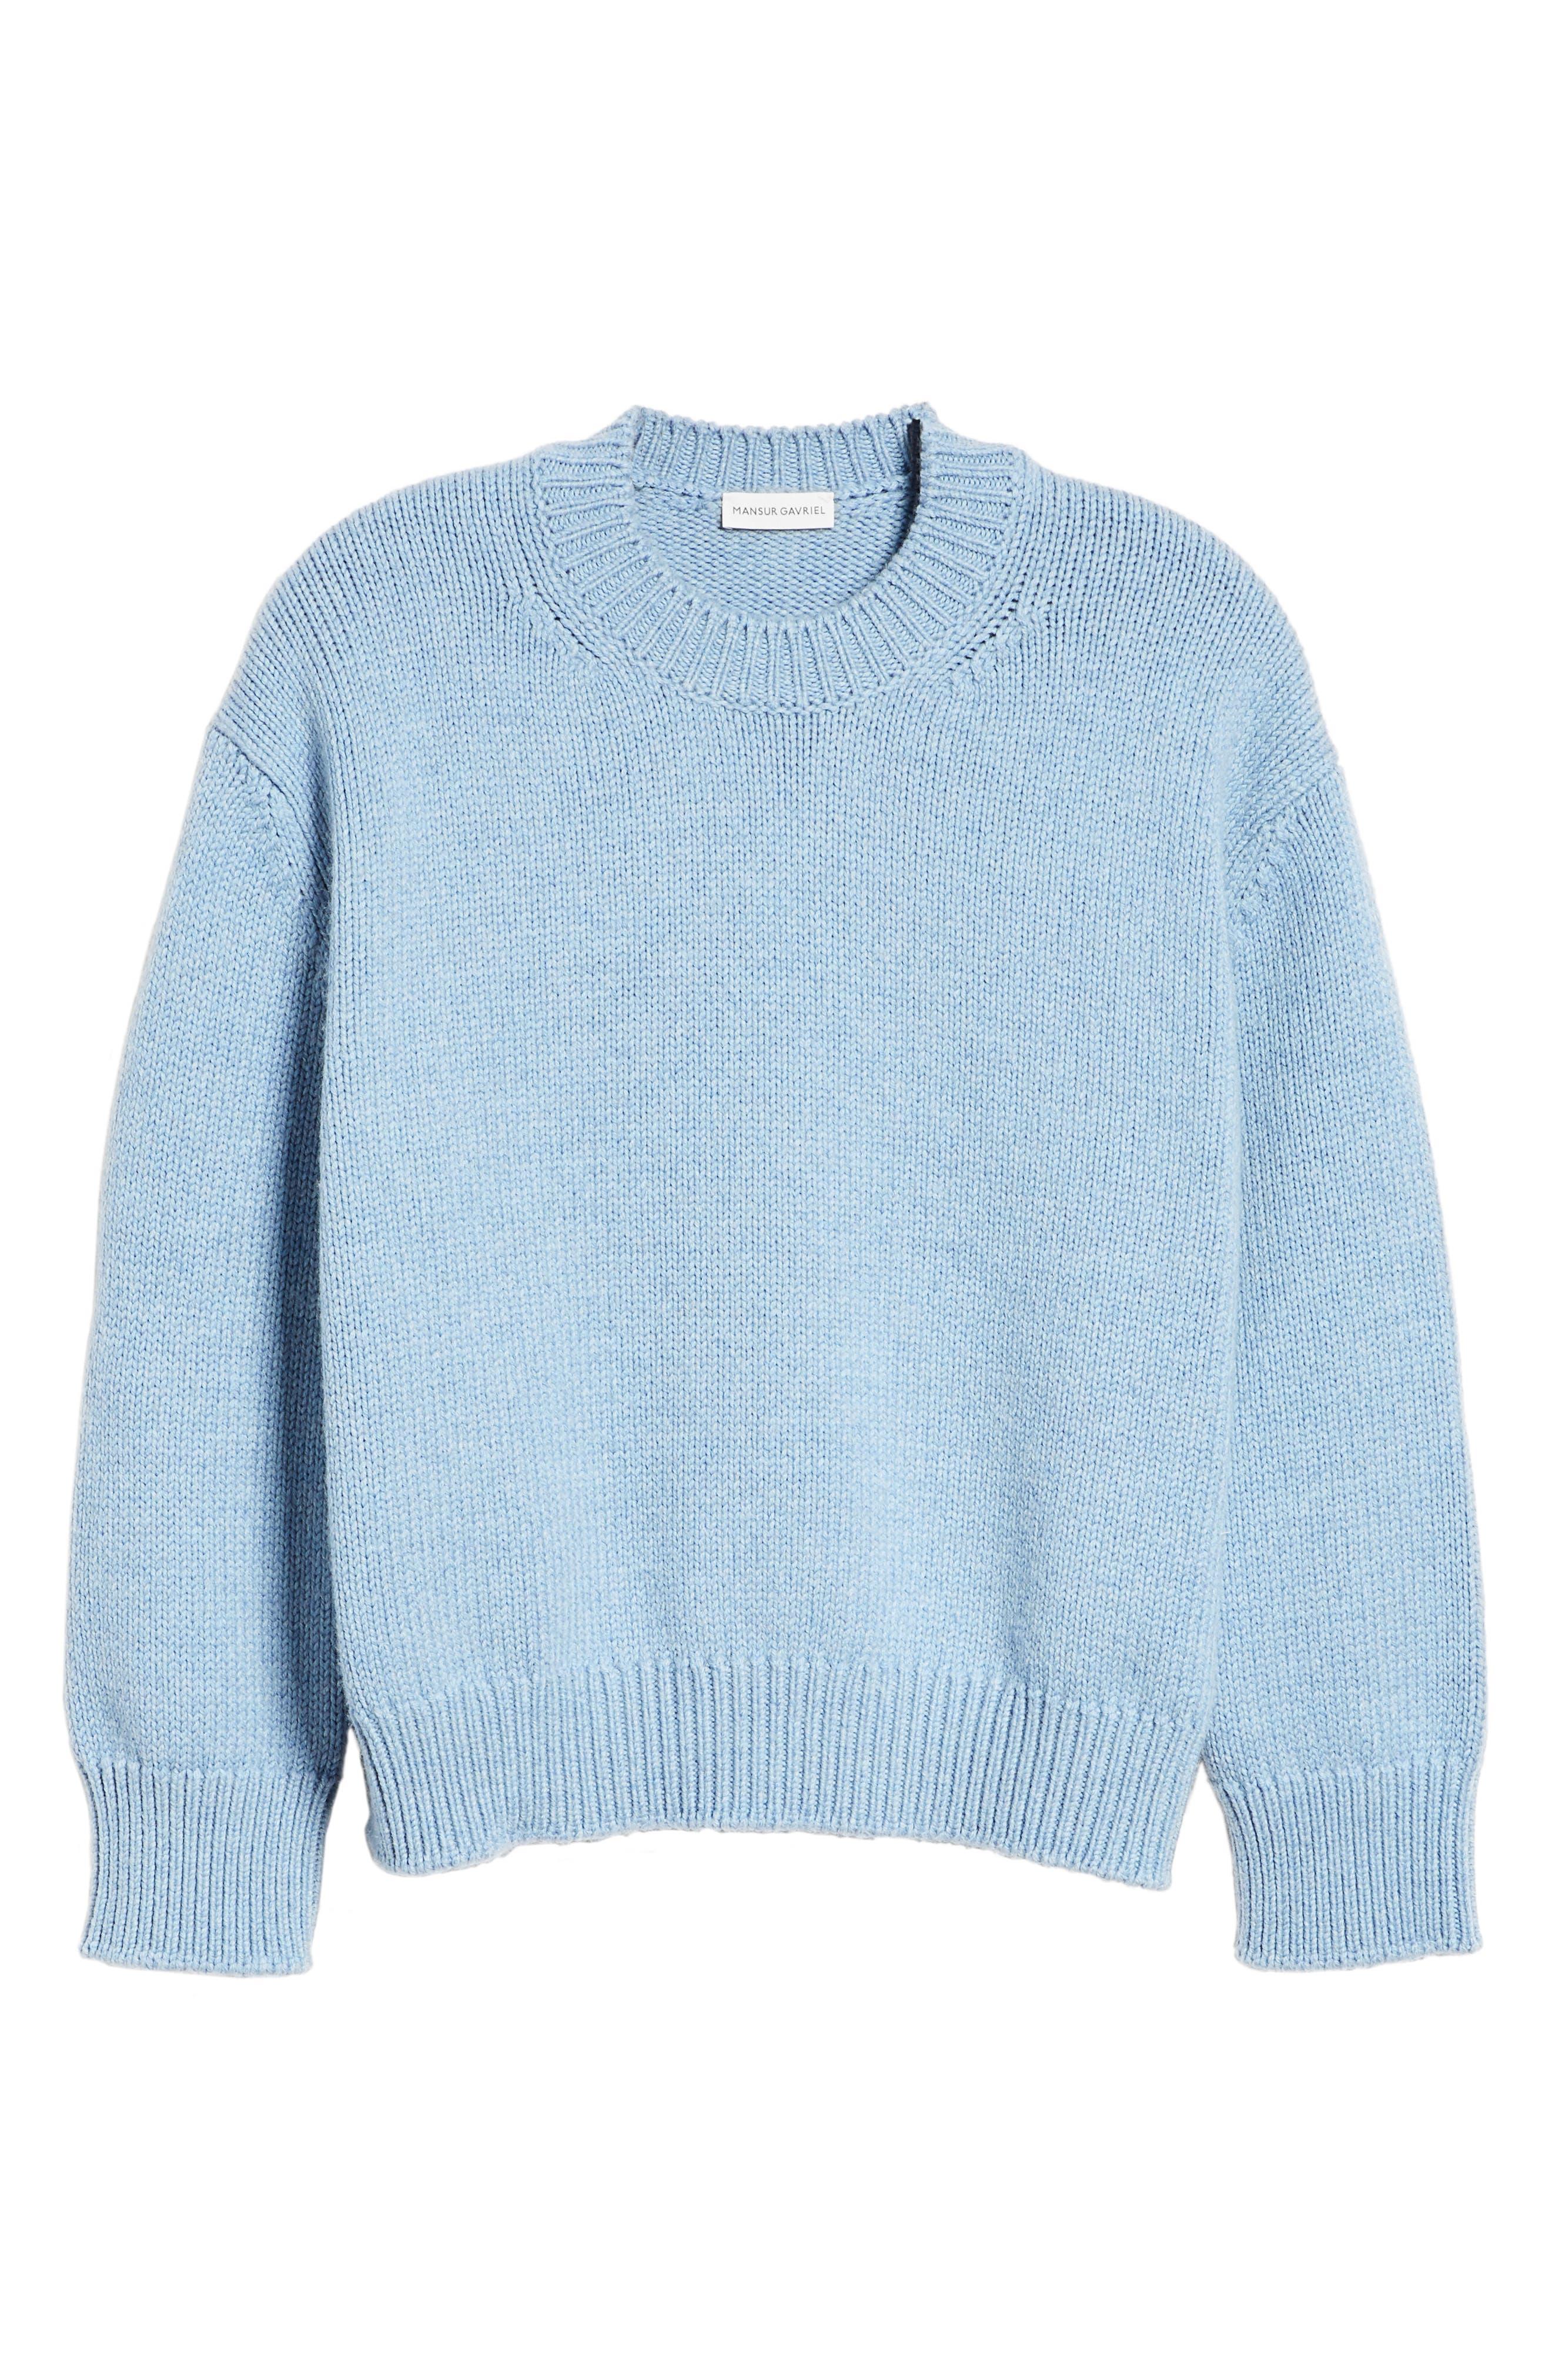 Merino Wool Sweater,                             Alternate thumbnail 6, color,                             SKY BLUE